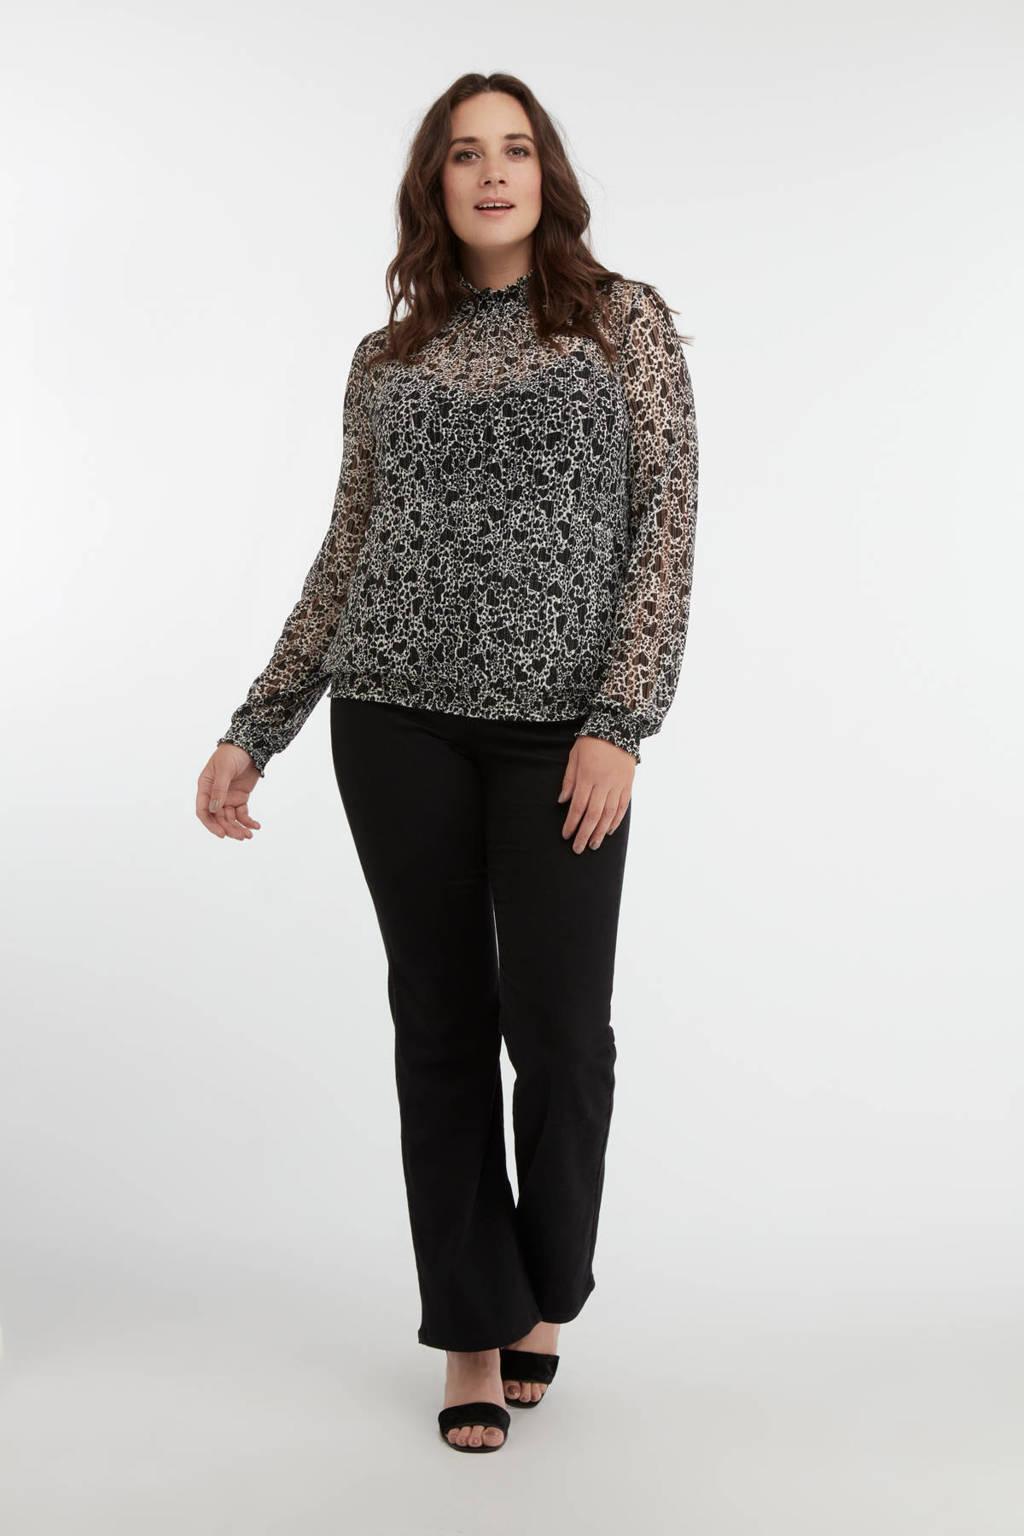 MS Mode semi-transparante top met all over print zwart/wit, Zwart/wit